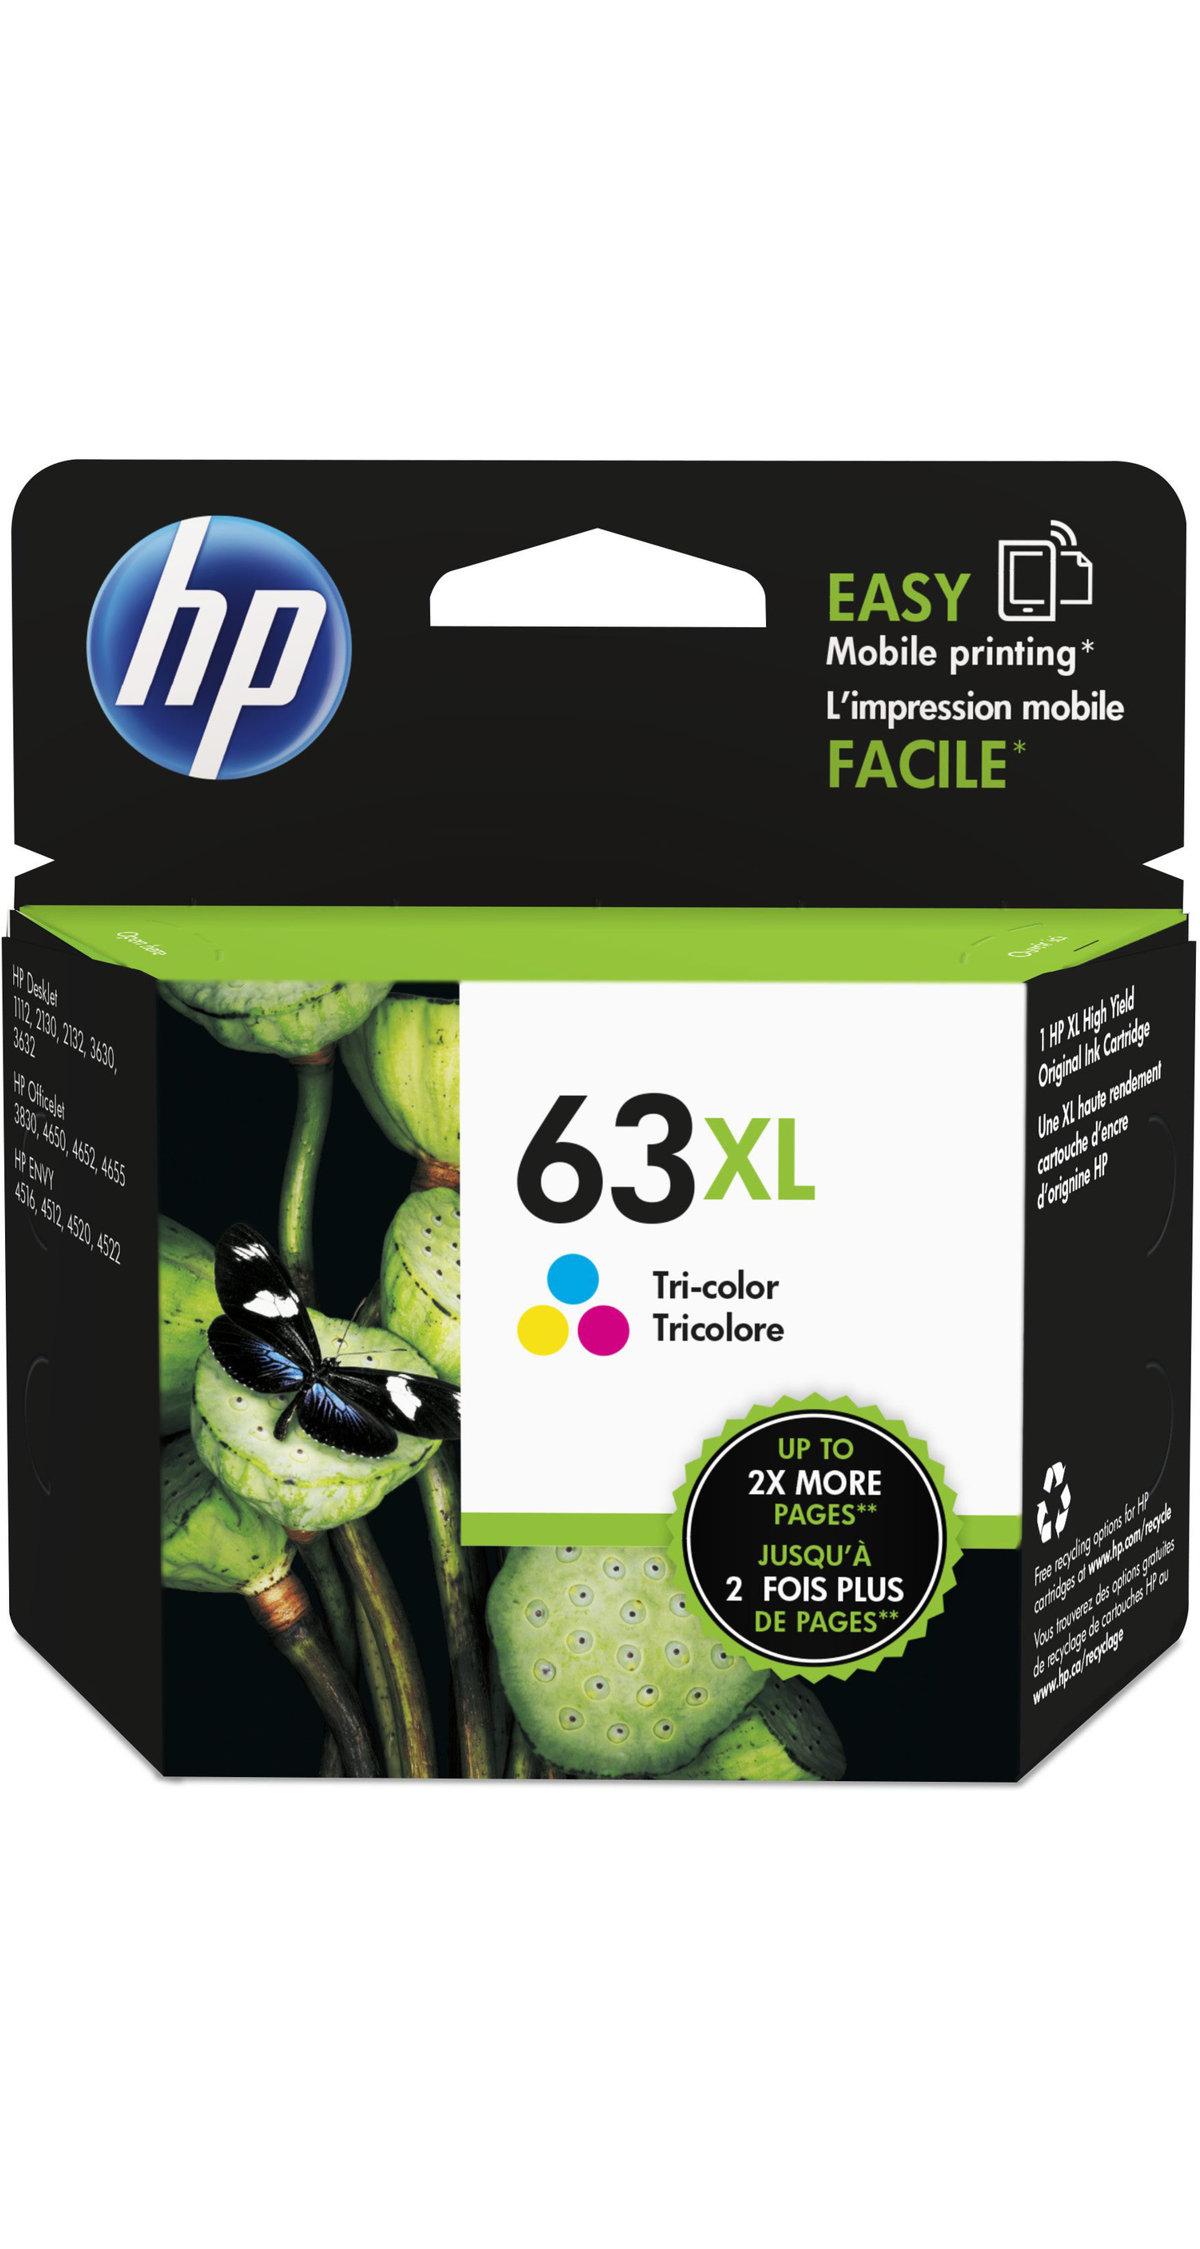 HP 63XL Tri color High Yield Original Ink Cartridge F6U63AN by fice Depot & ficeMax